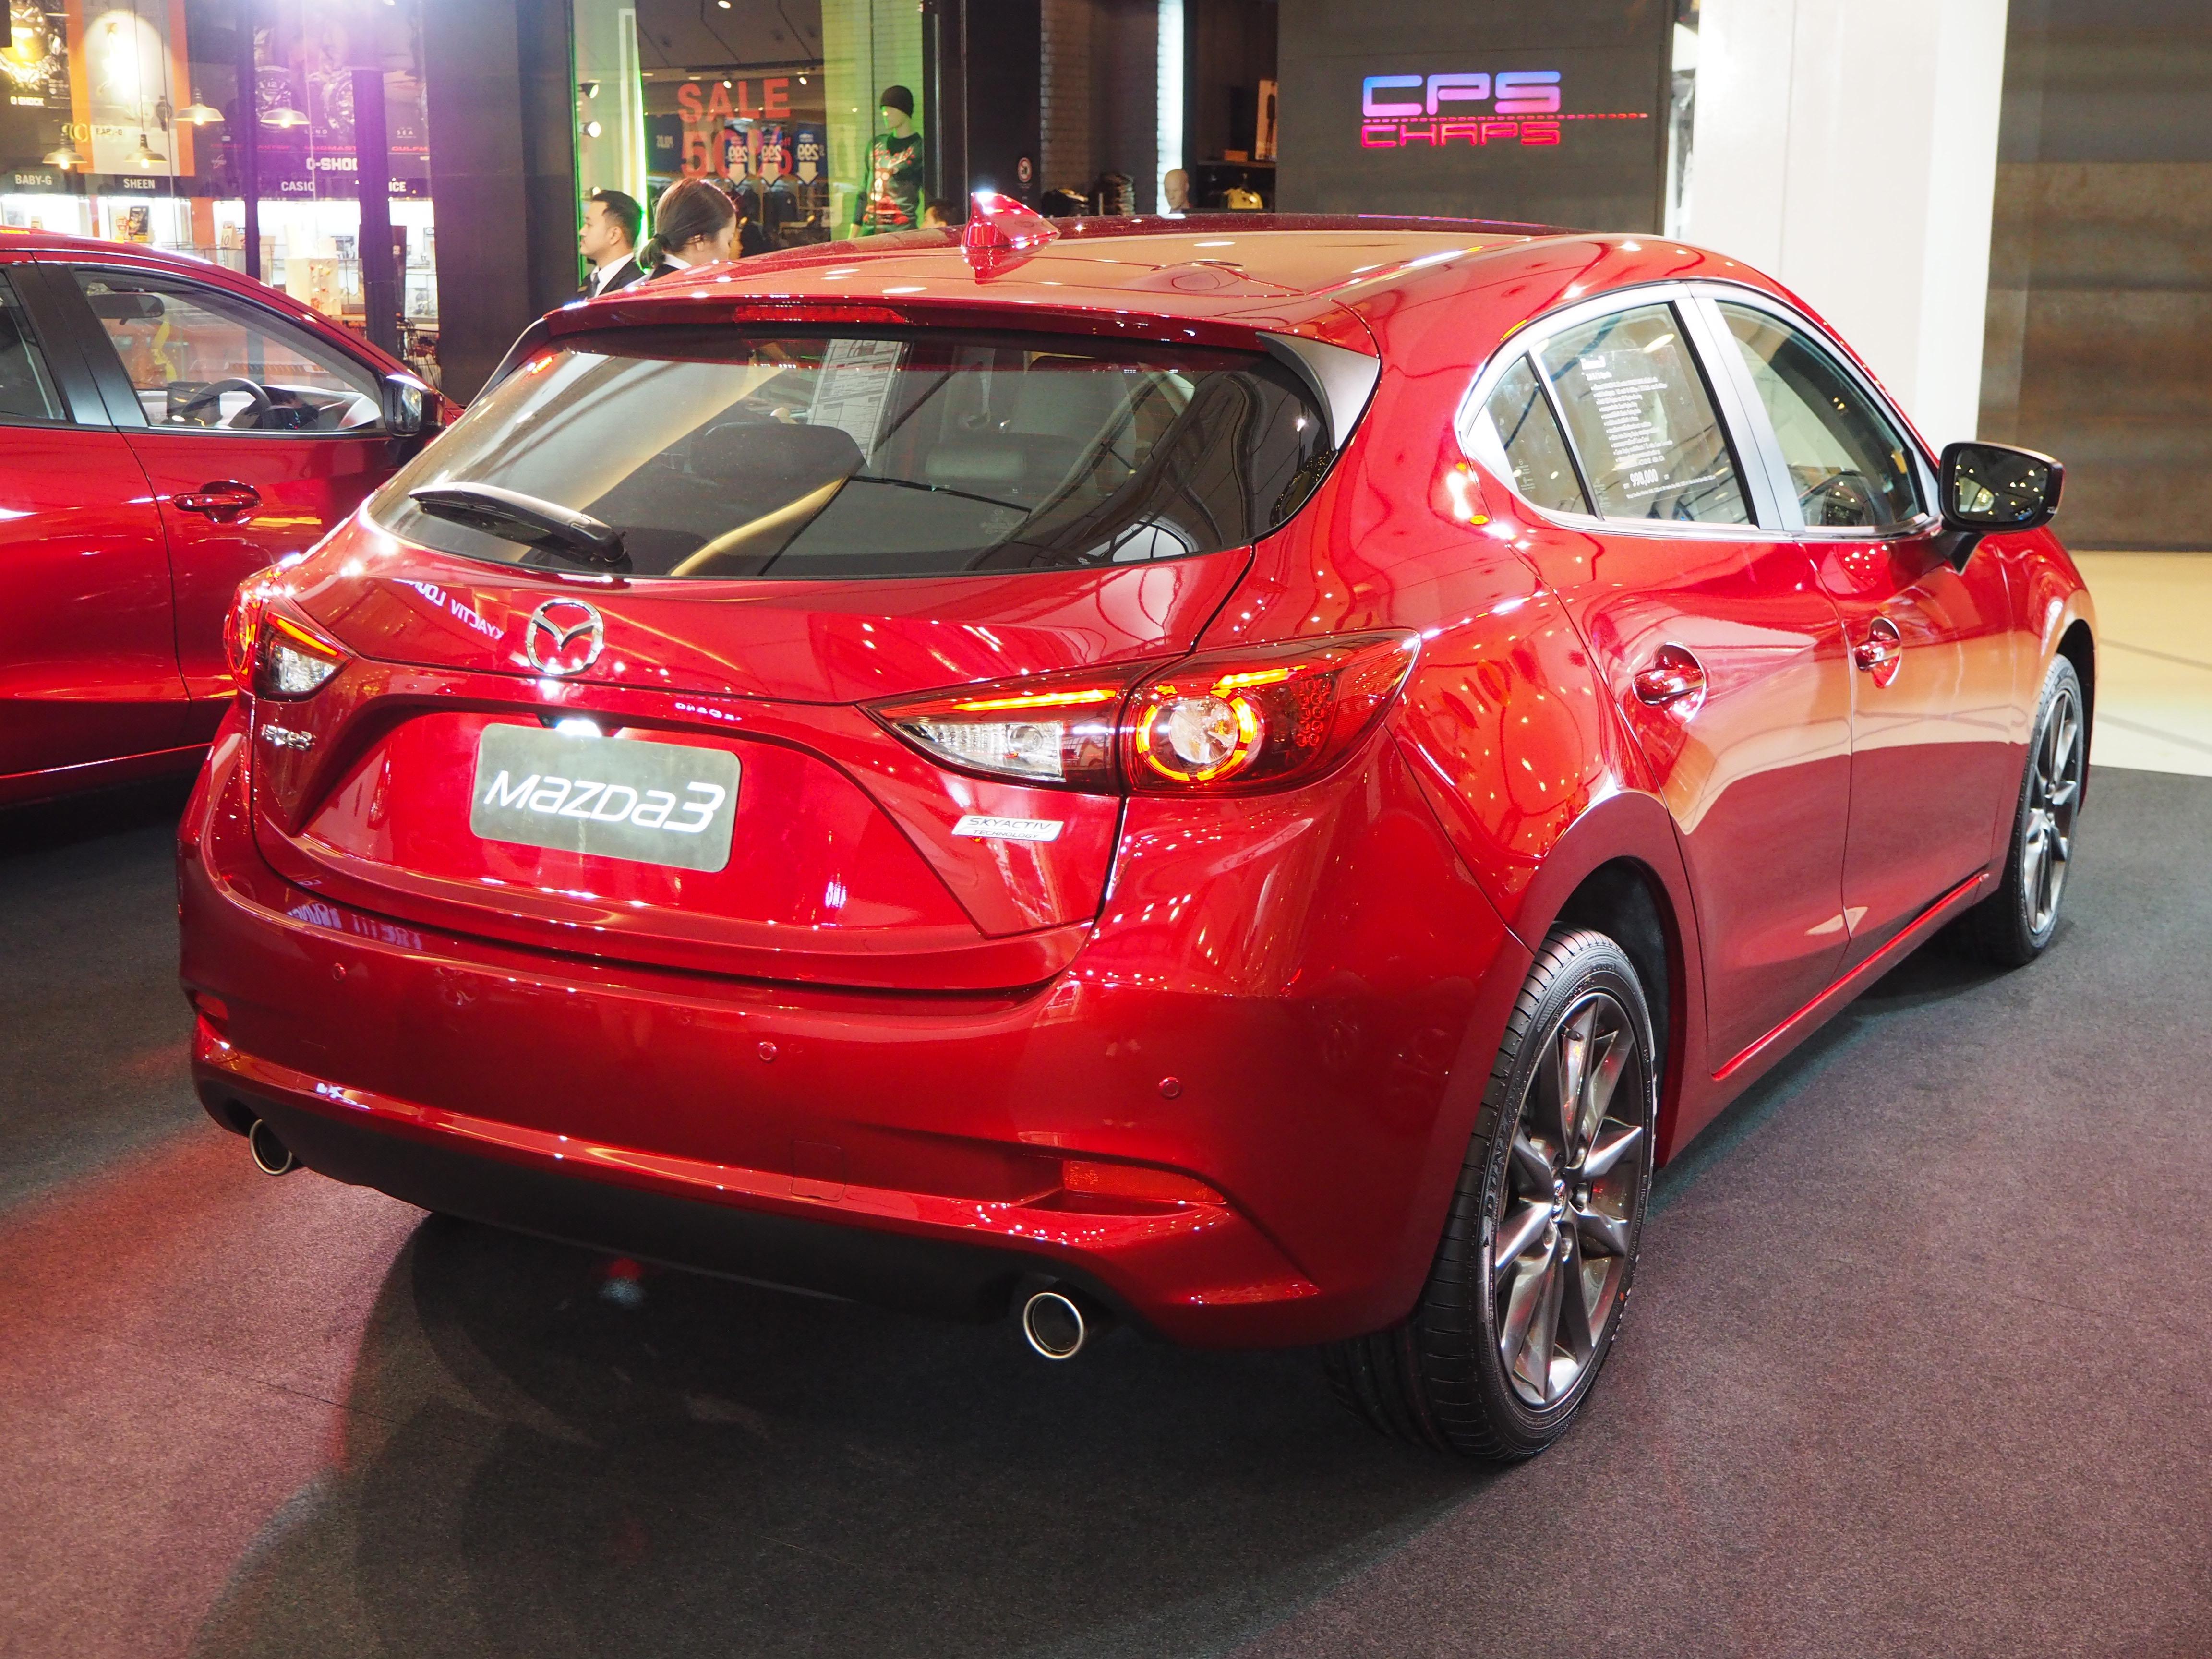 Kelebihan Kekurangan Mazda 3 2018 Murah Berkualitas